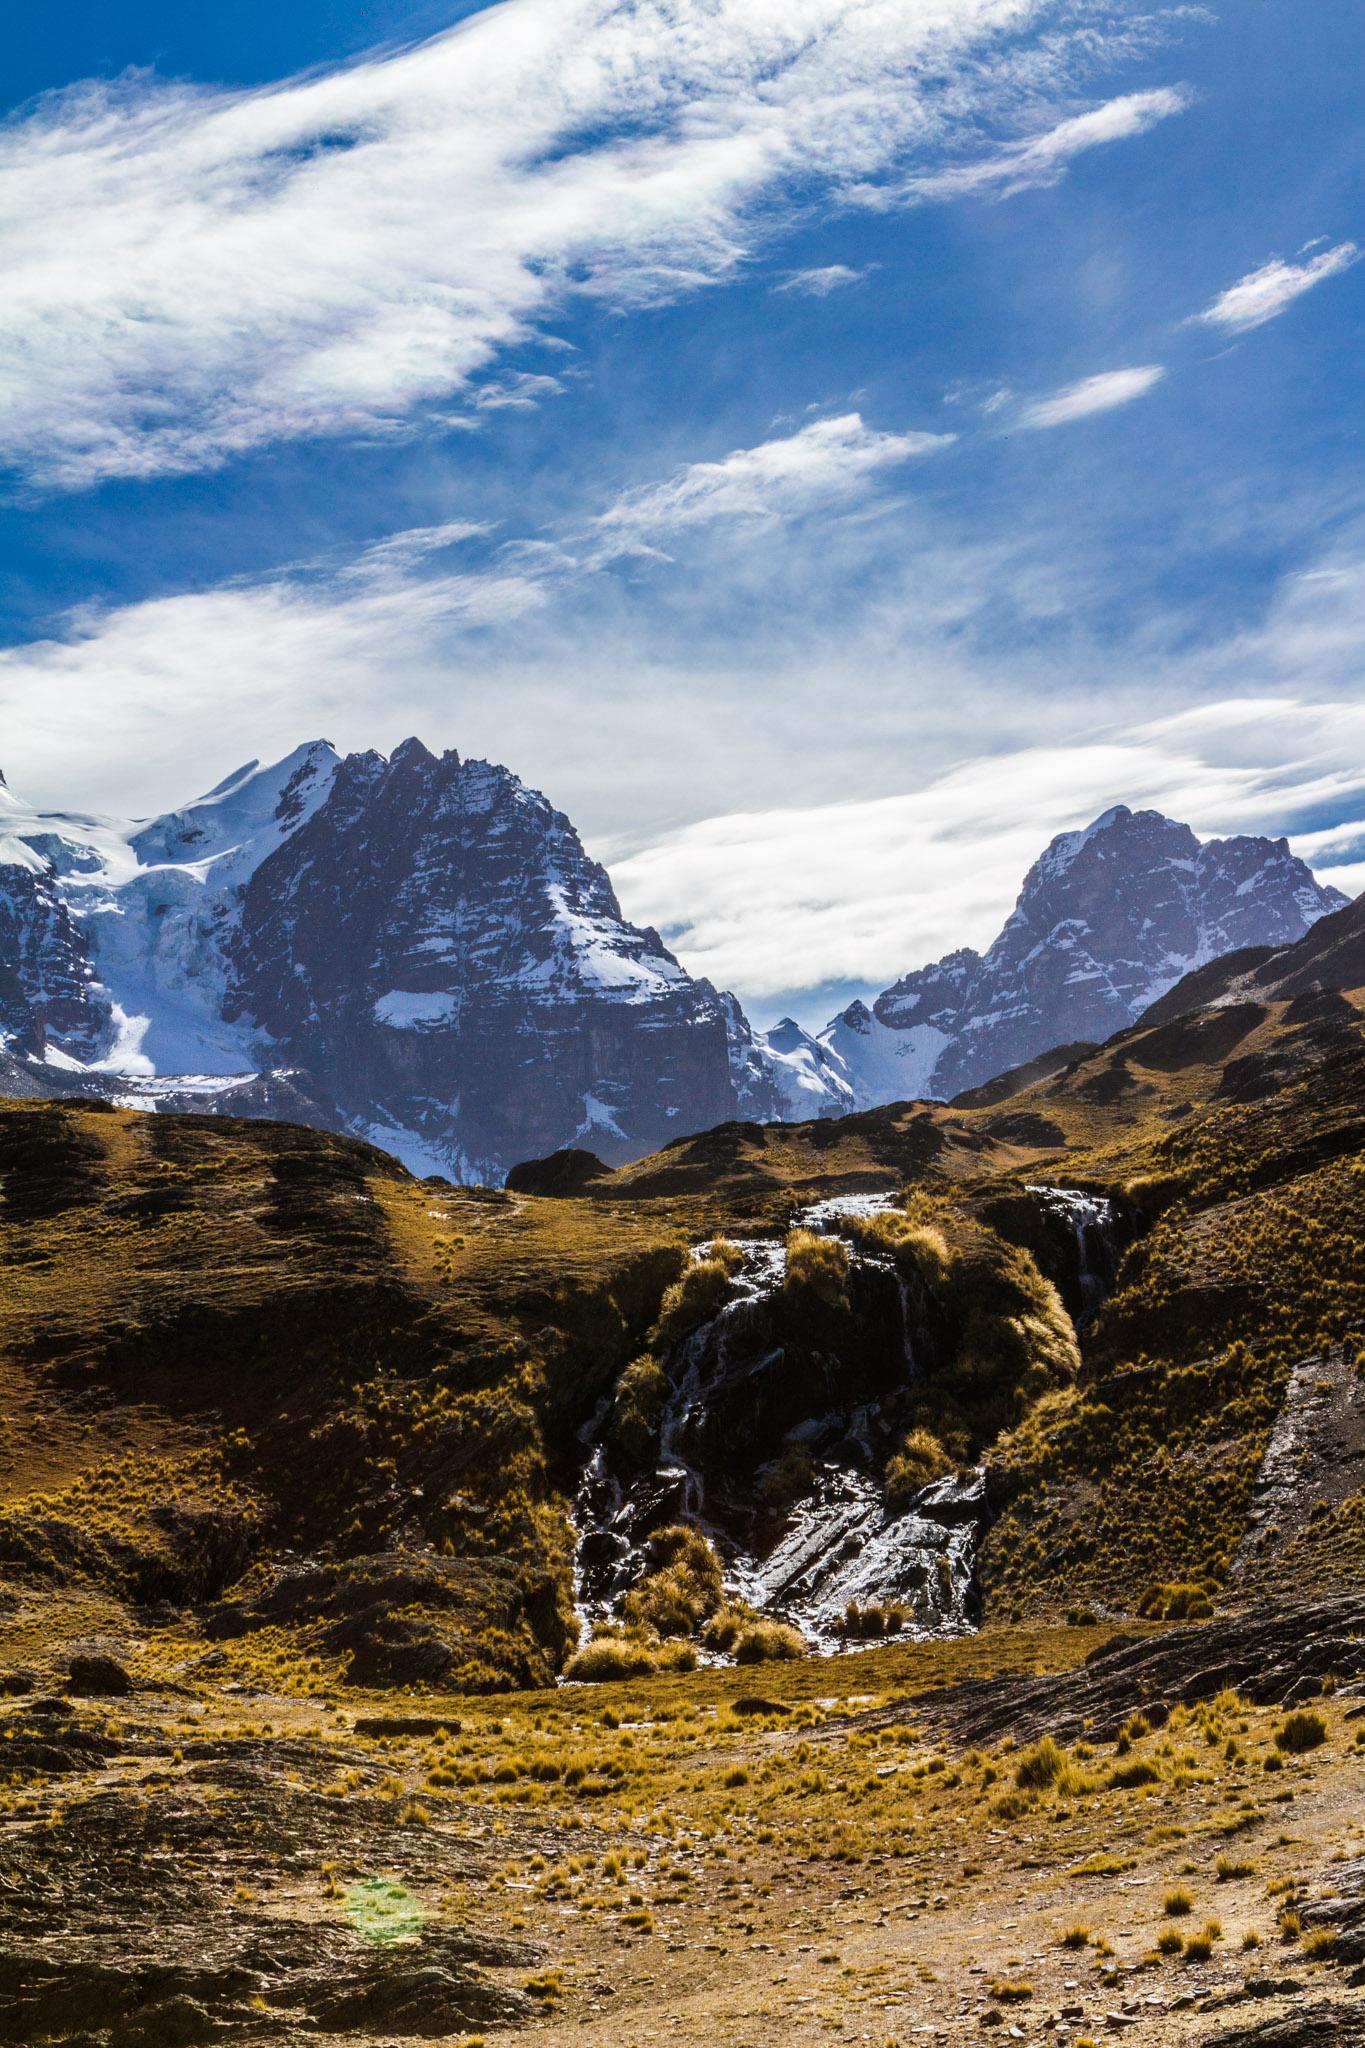 Ali-Barqawi-Studios-Explore-Series-Travel-Adventure-Documentary-C4CGAZA-Bolivia-Mount-Tarija-2015-245.jpg